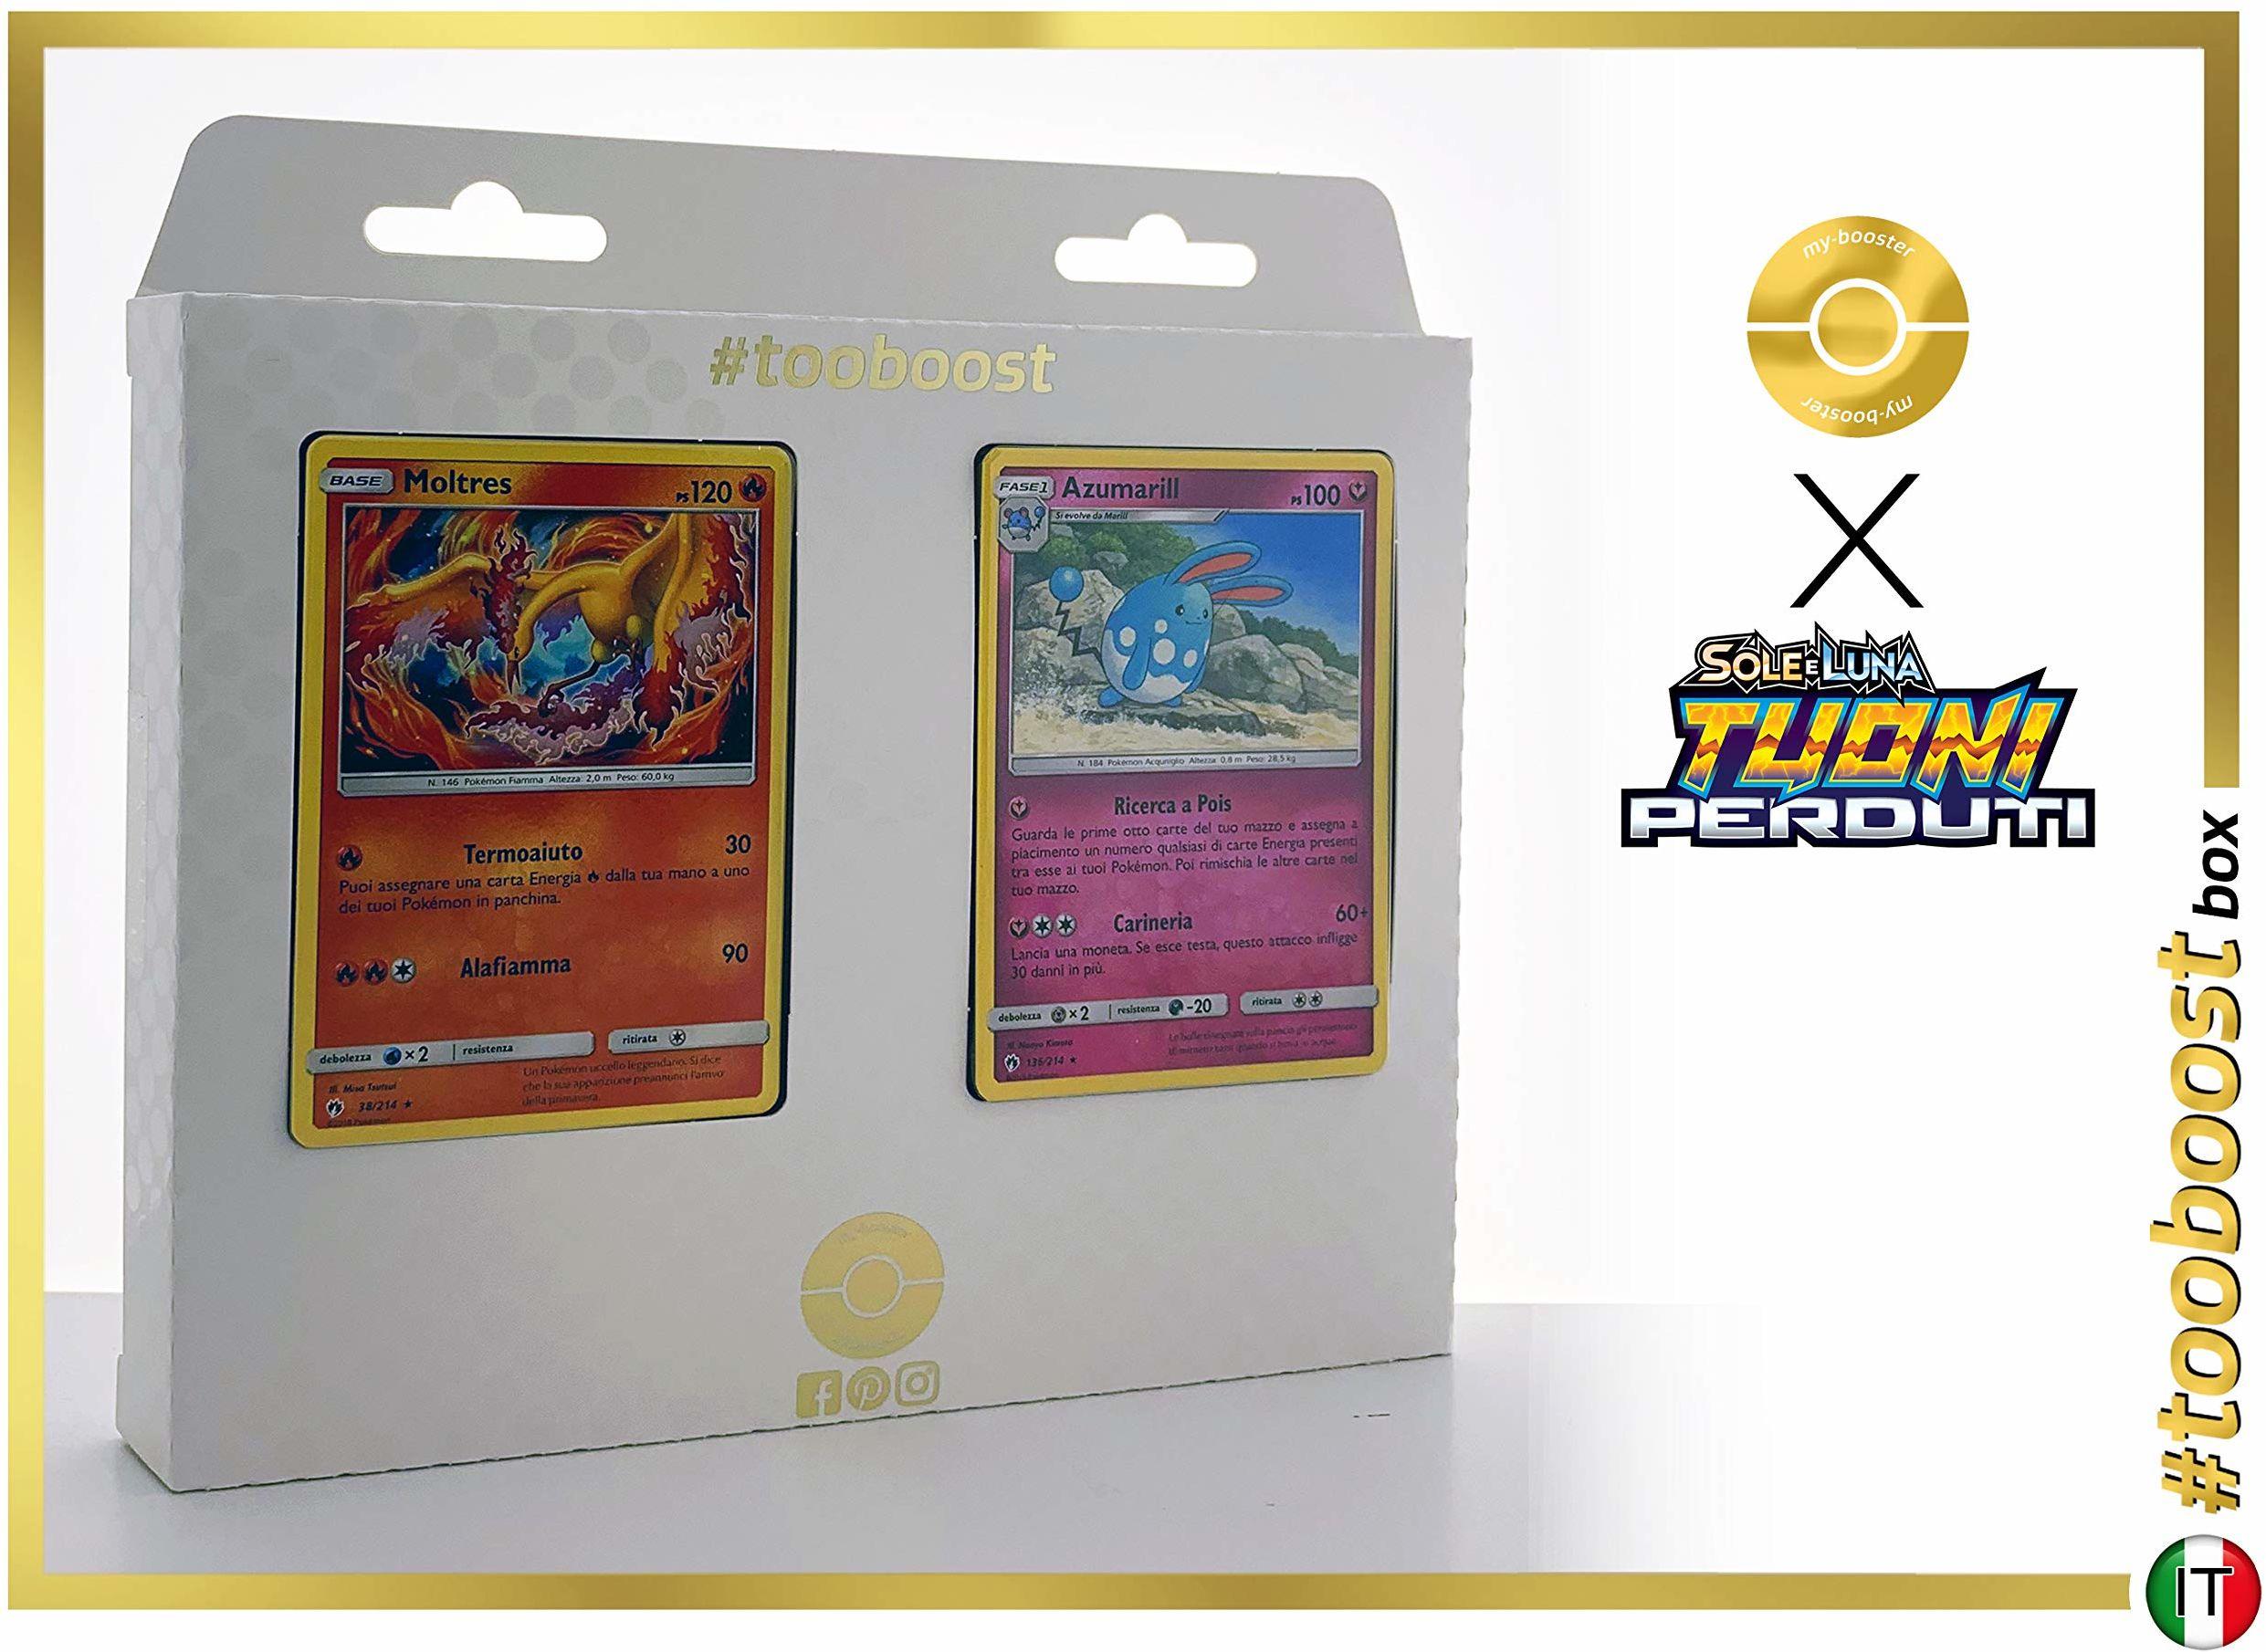 Moltres (Lavados) 38/214 & Azumarill 136/214  #tooboost X Sole E & Luna 8 Tuoni Perduti Box z 10 włoskimi kartami Pokémon + 1 Pokémon-Goodie